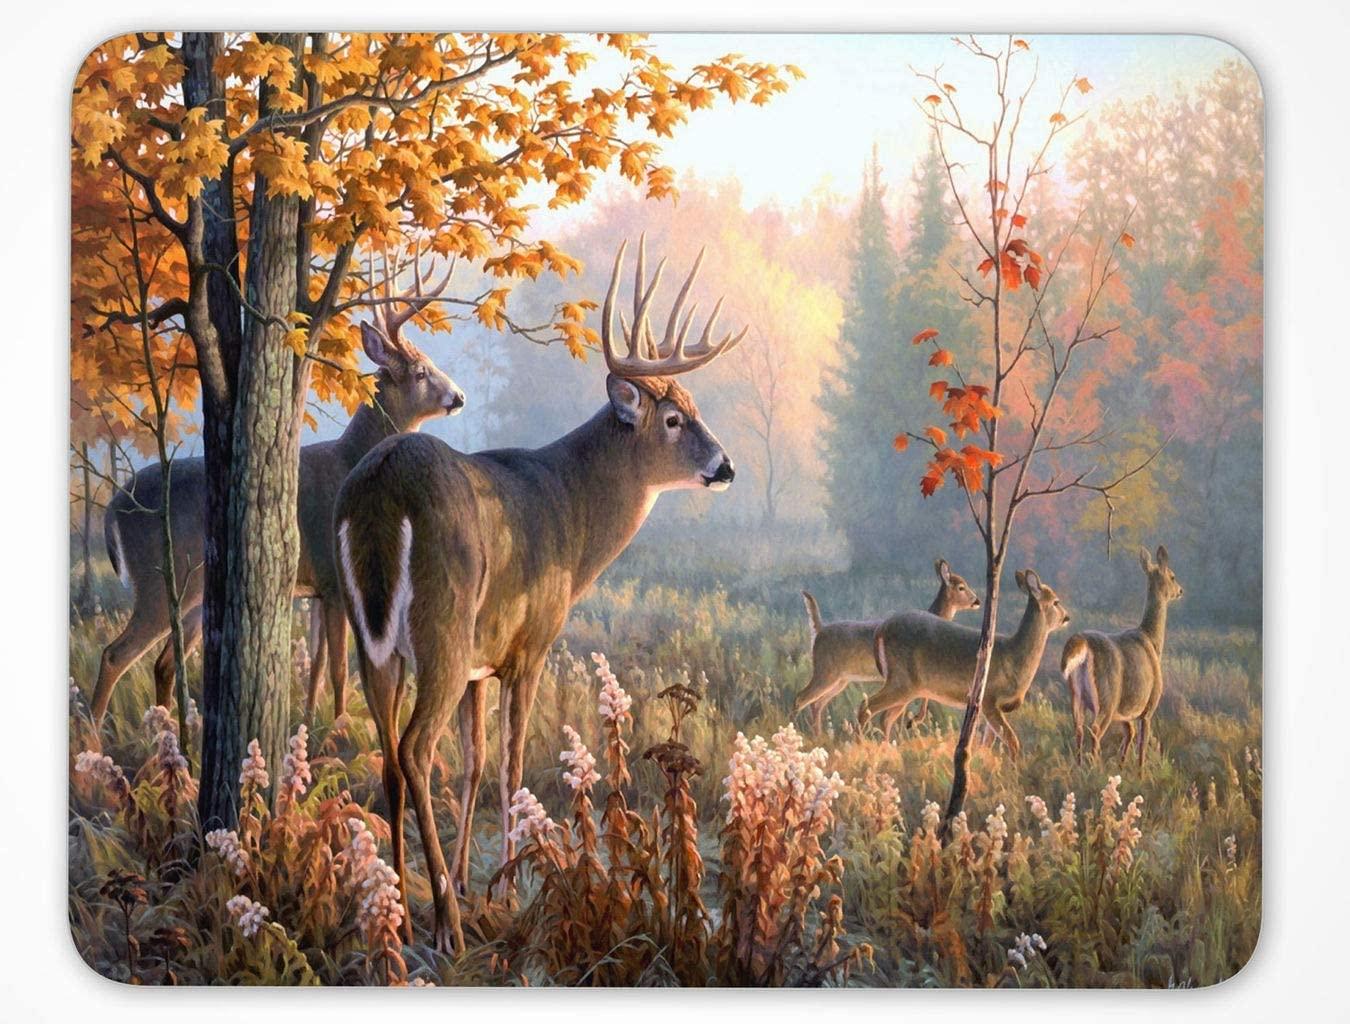 Nature Wildlife Animal Deer Hunting Season Mouse Pad, Autumn Forest Deer Mouse pad (Deer-Rec2)